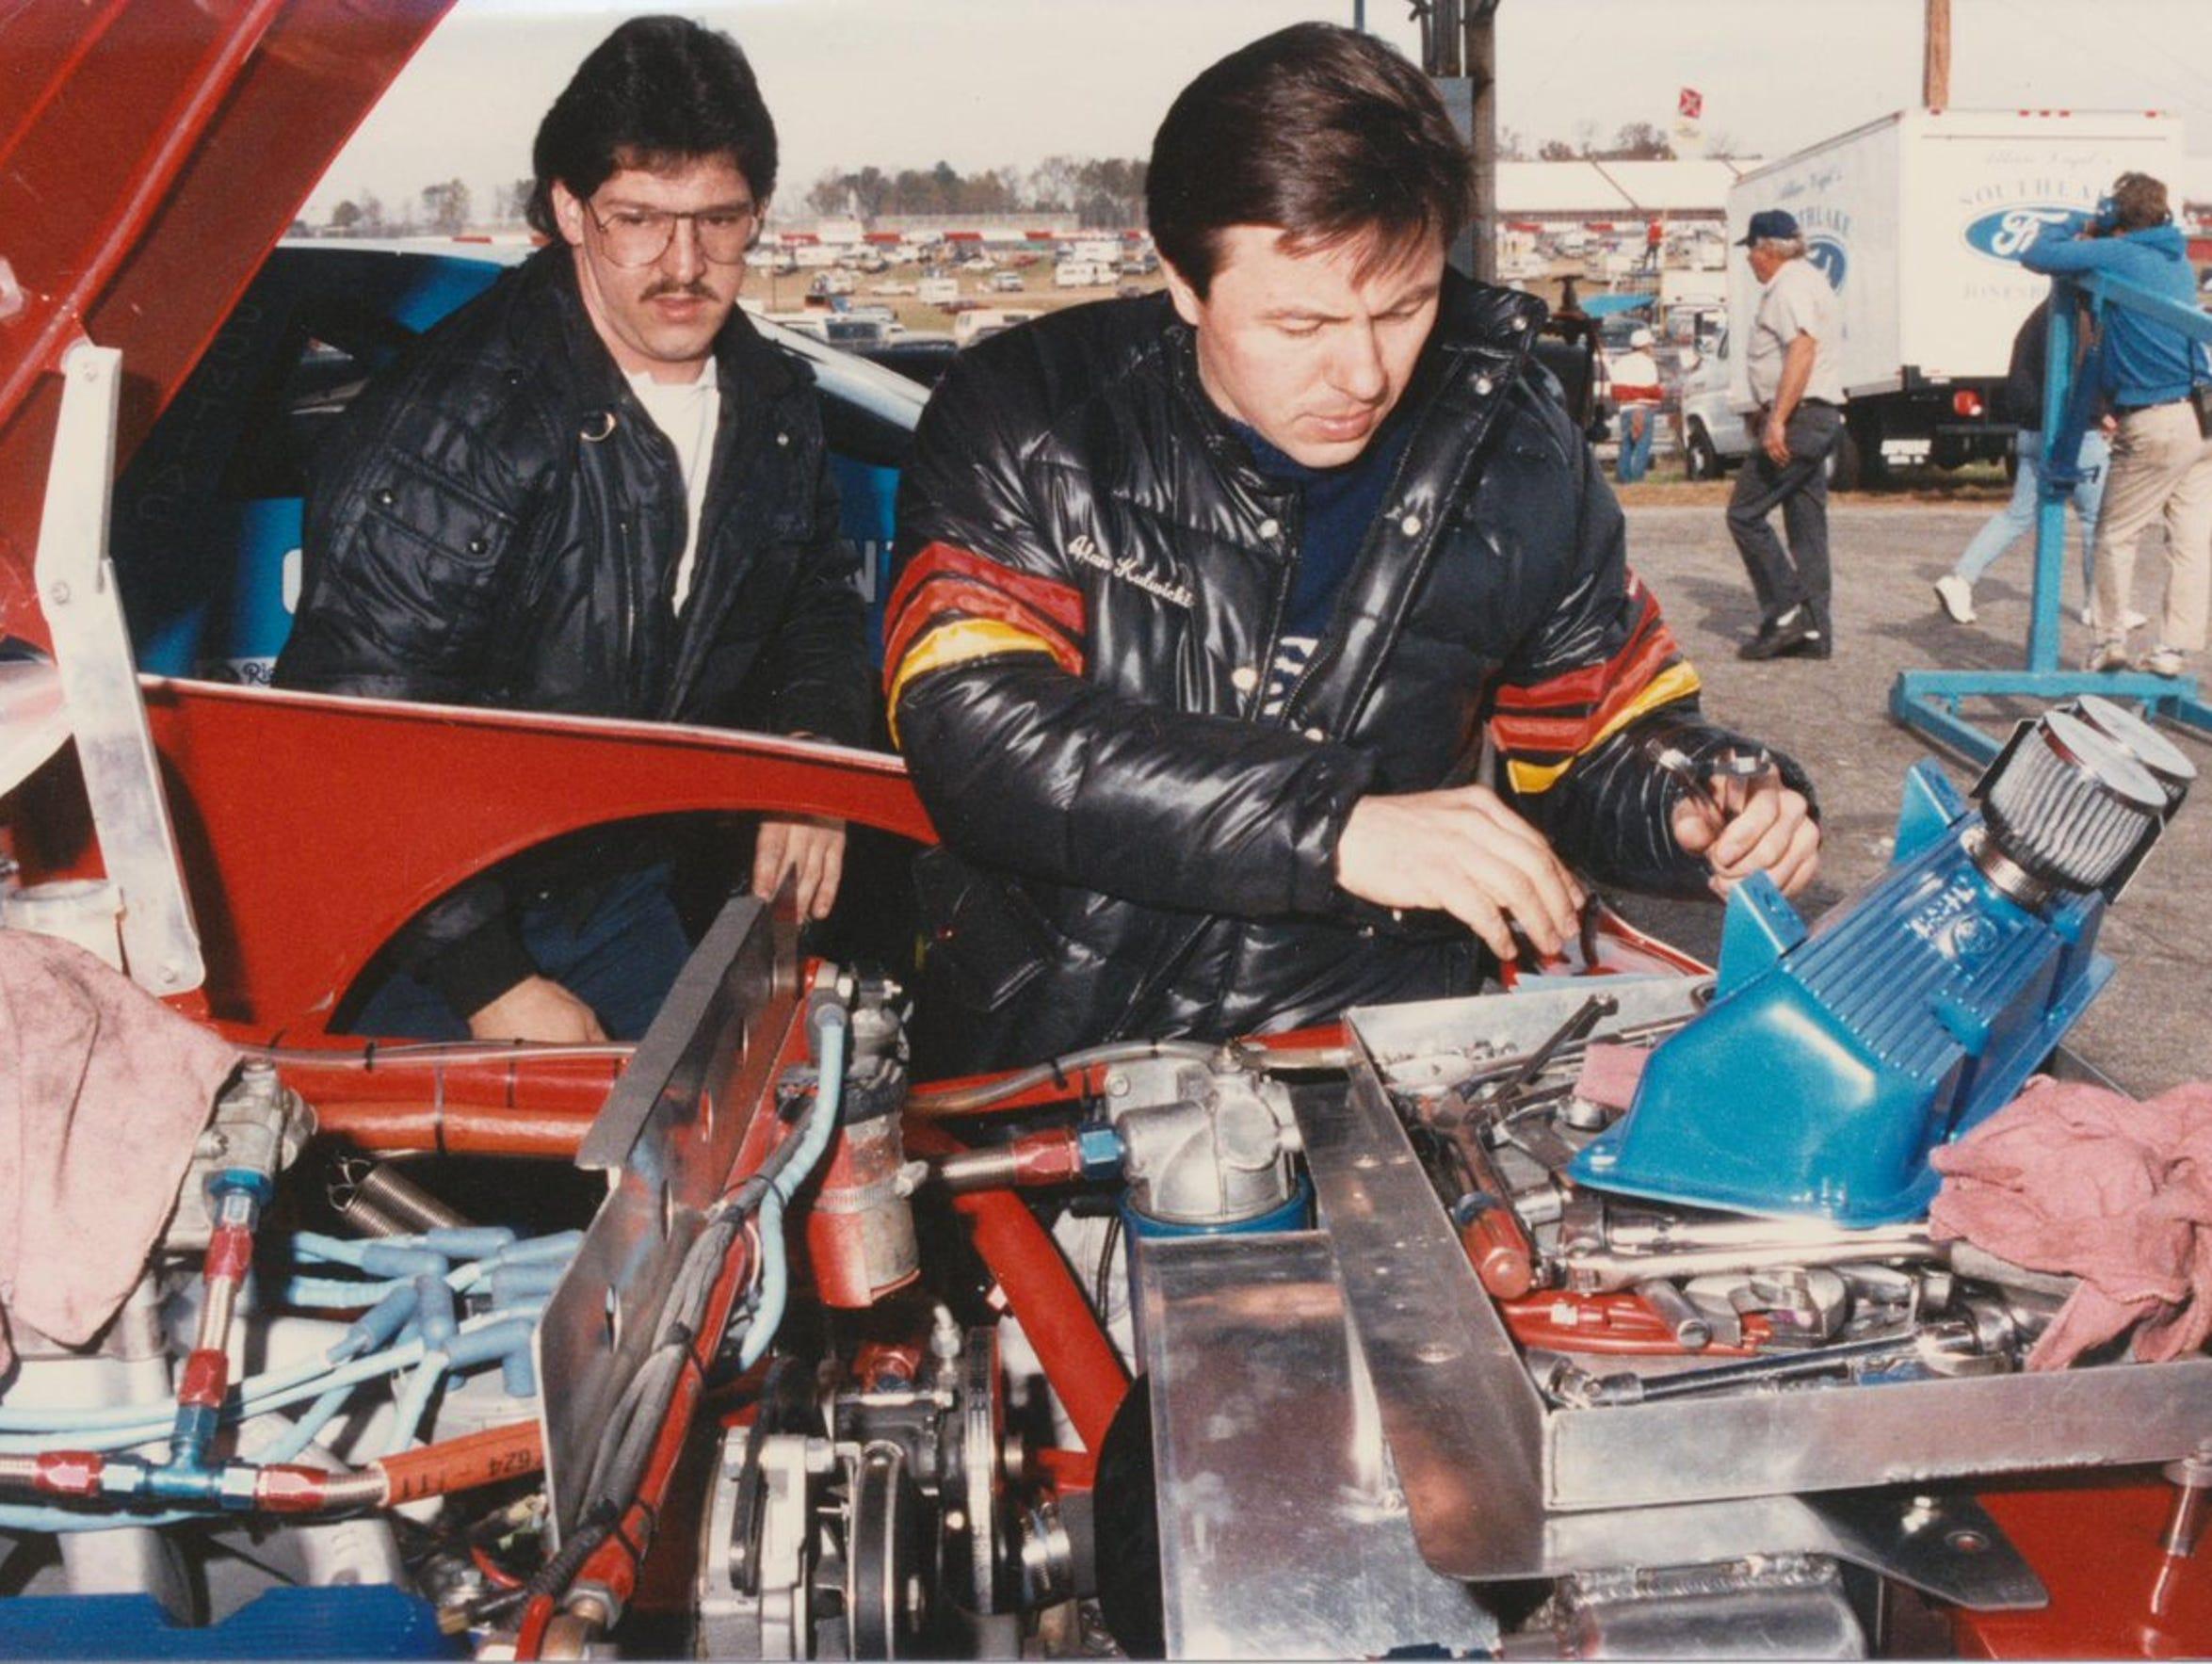 Owner/driver Alan Kulwicki and Joe Covington, a longtime